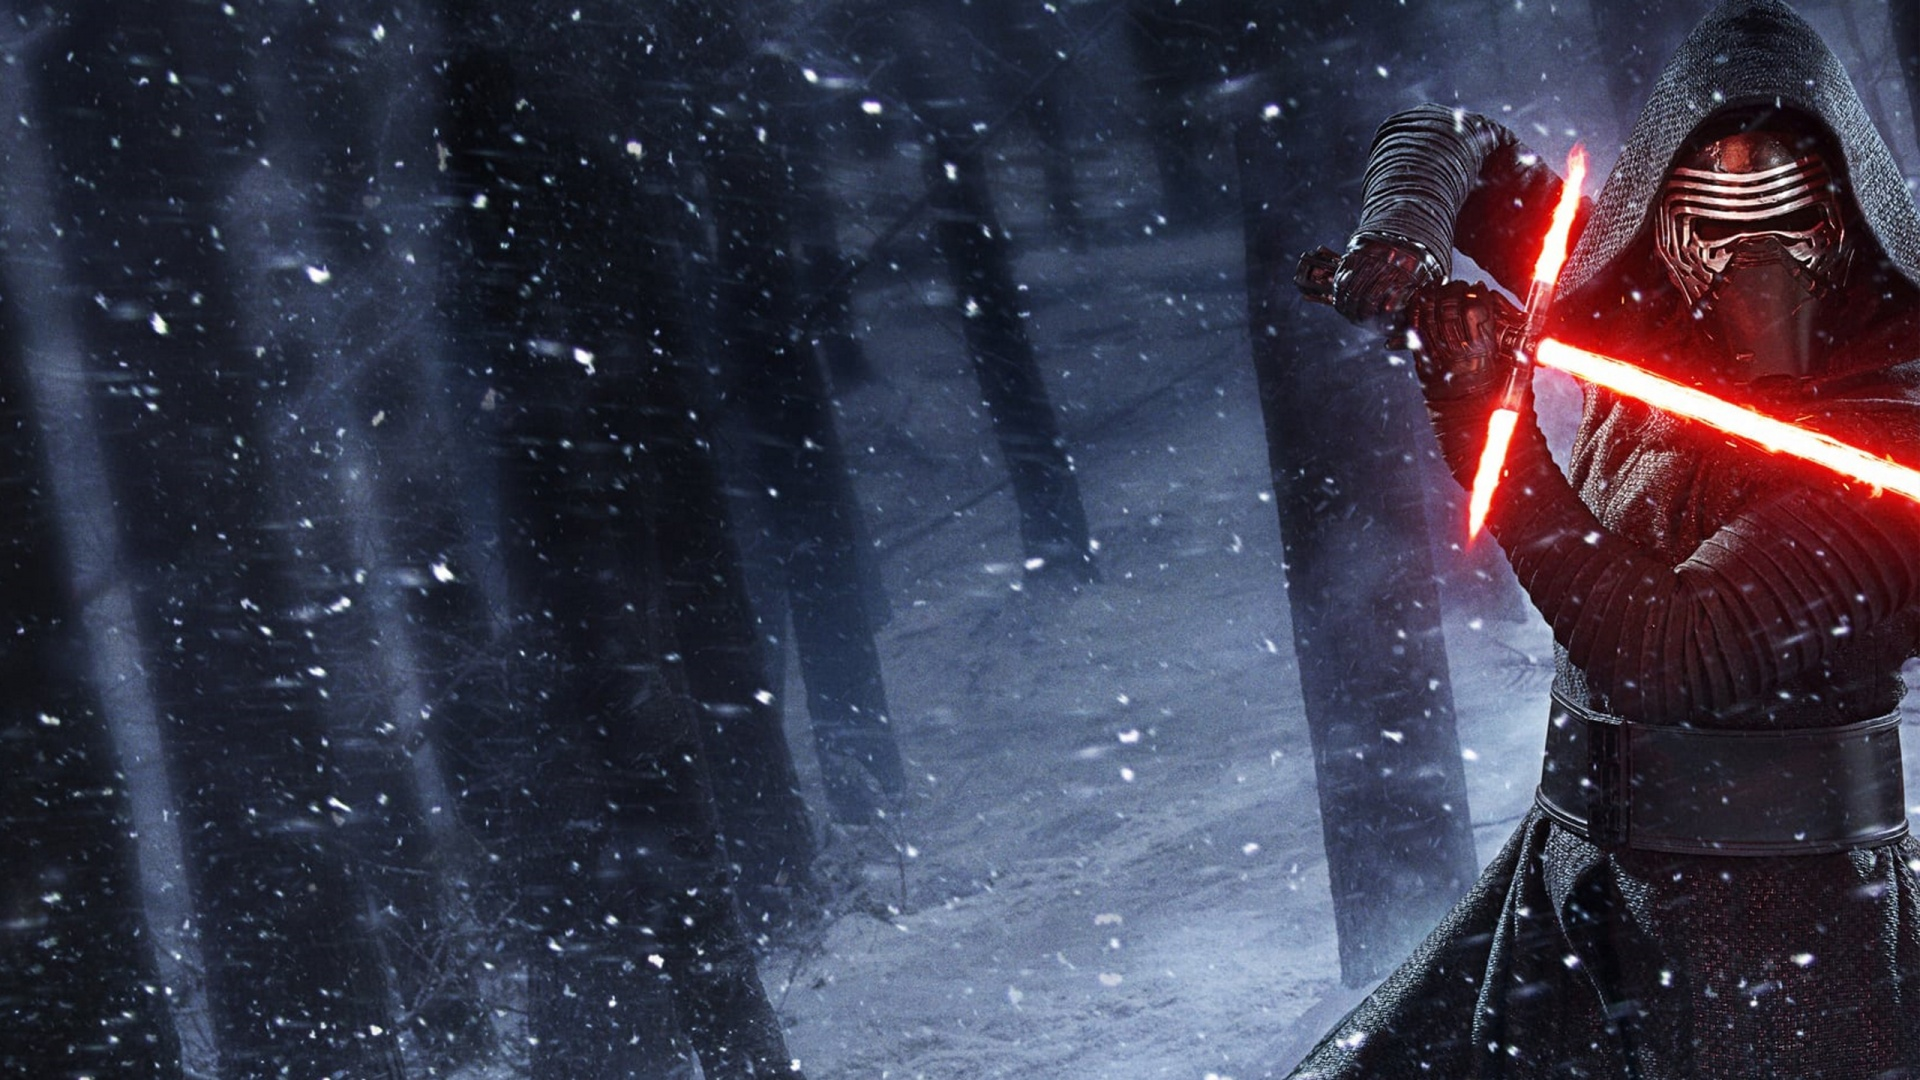 Kylo Ren Star Wars Lightsaber Wallpapers HD Wallpapers 1920x1080